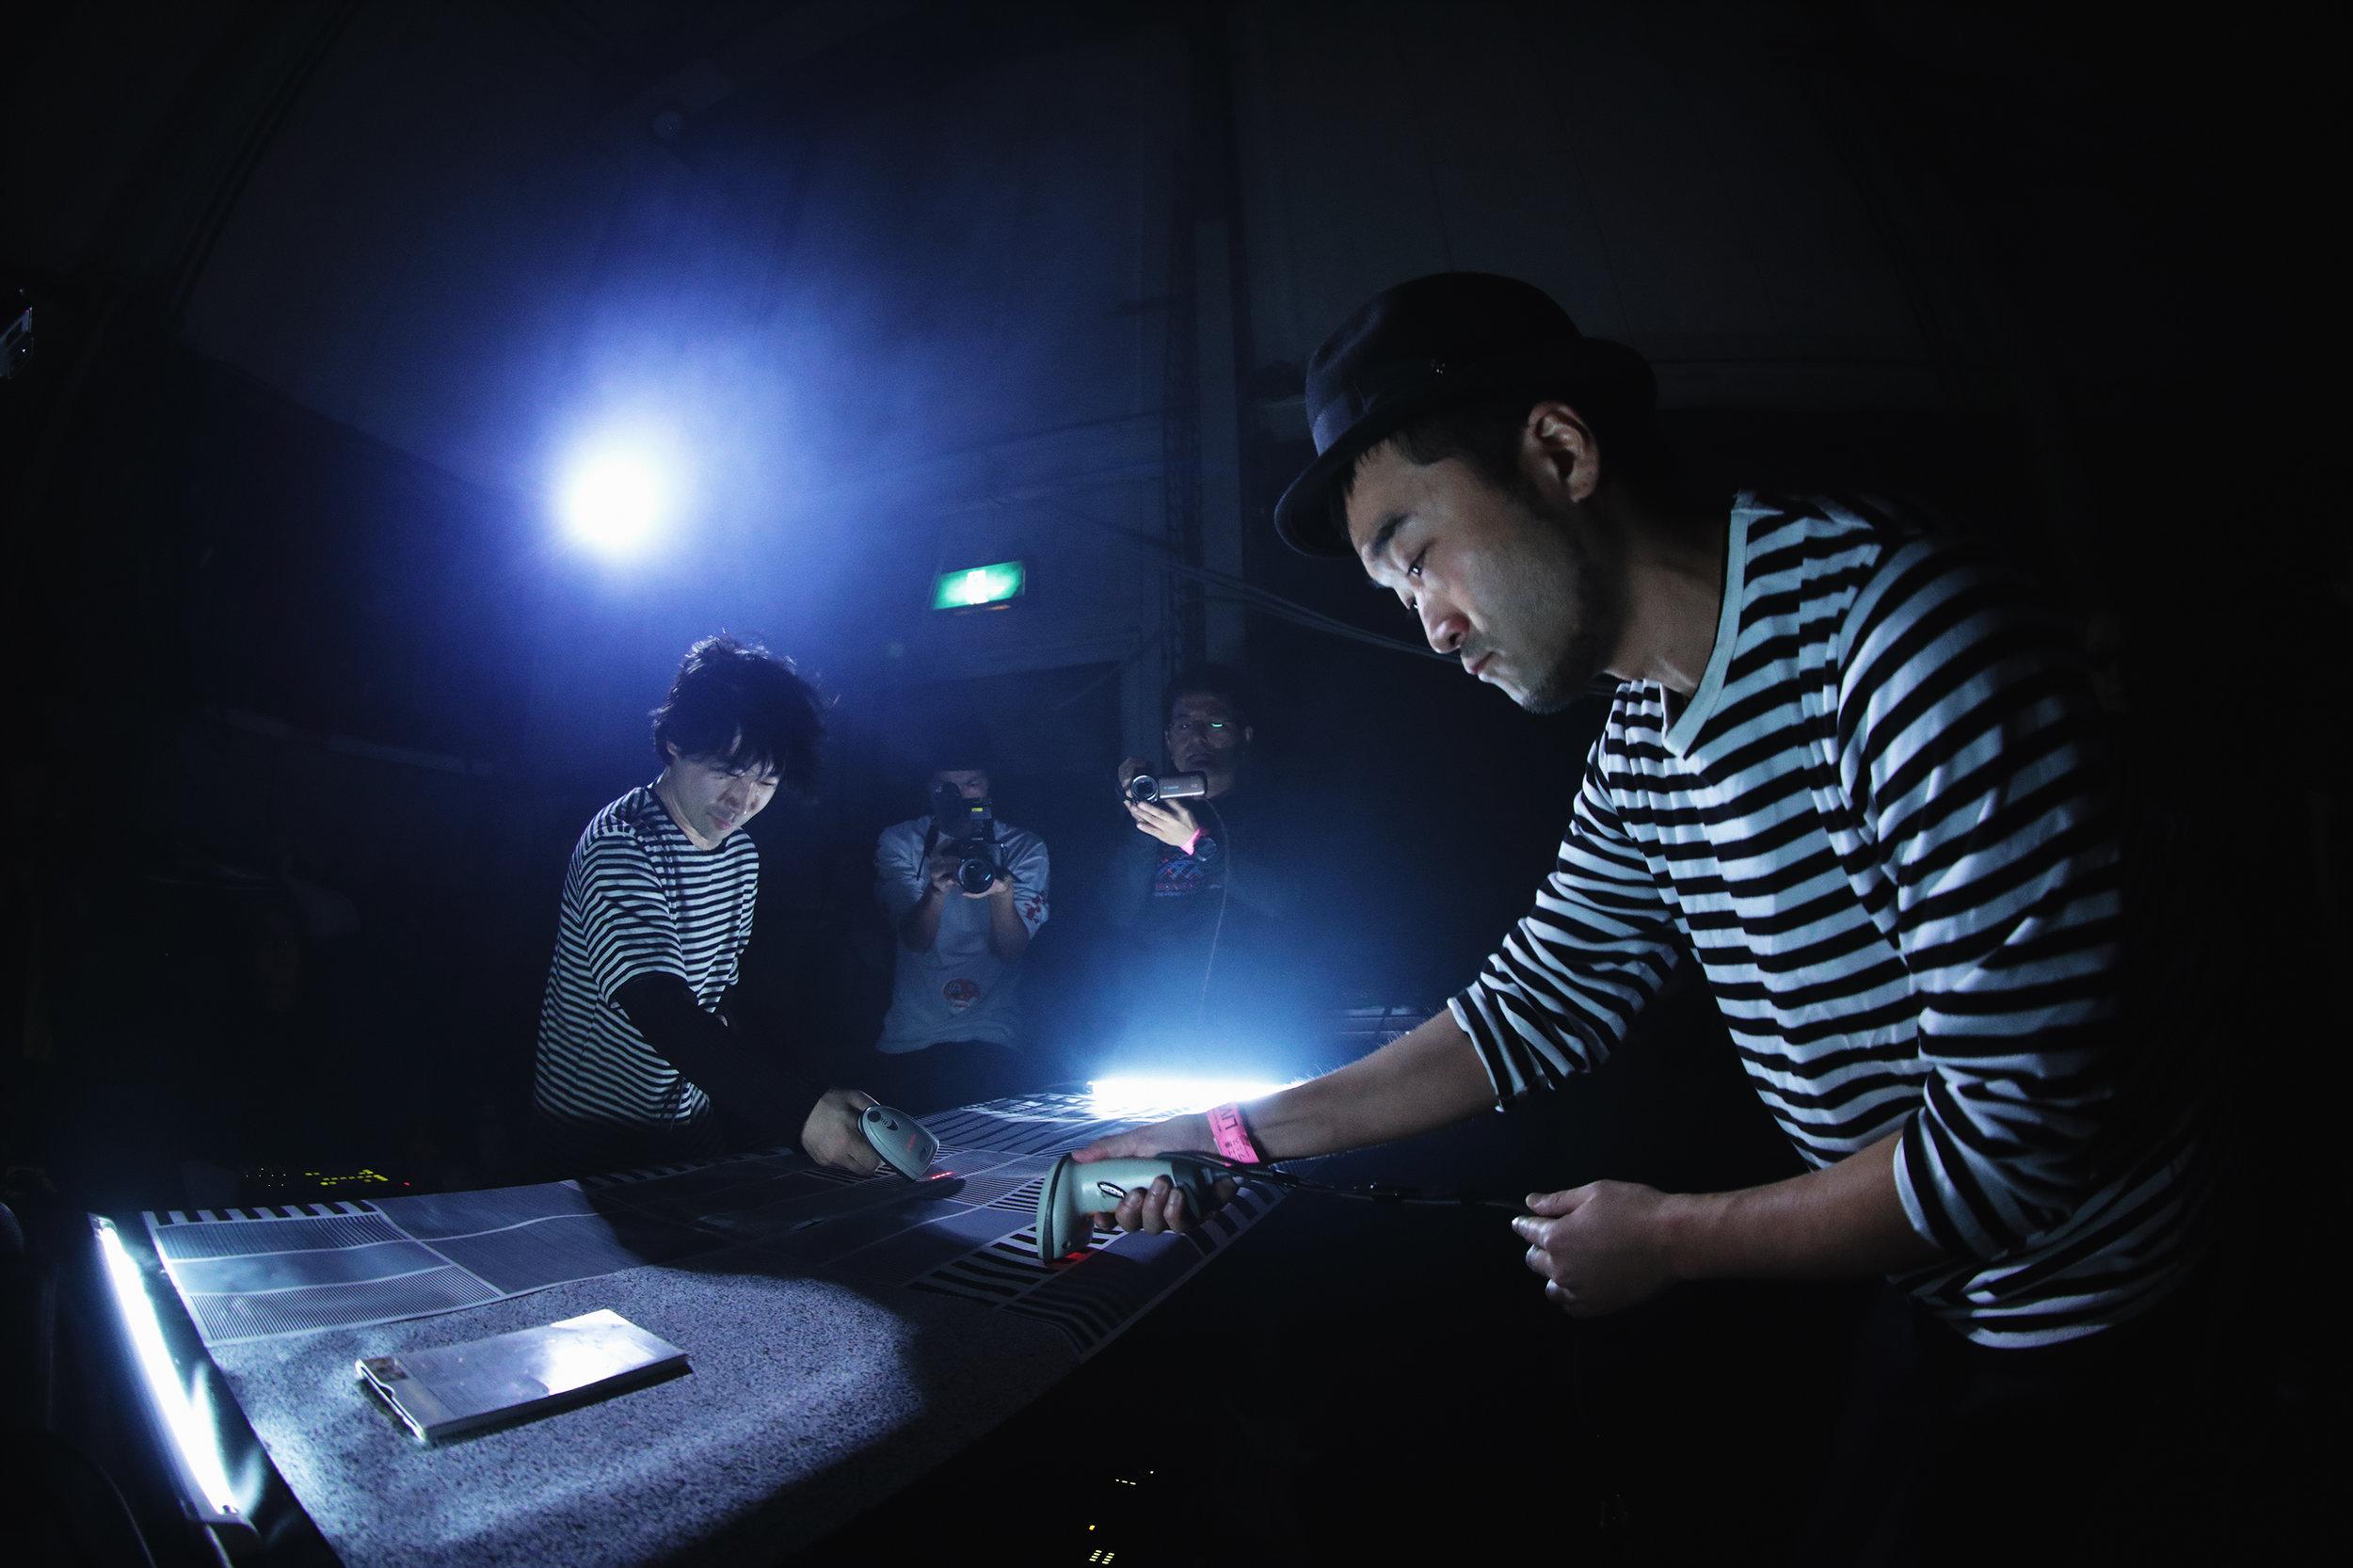 Barcoder Duo in 2018 / Photo by Mao Yamamoto